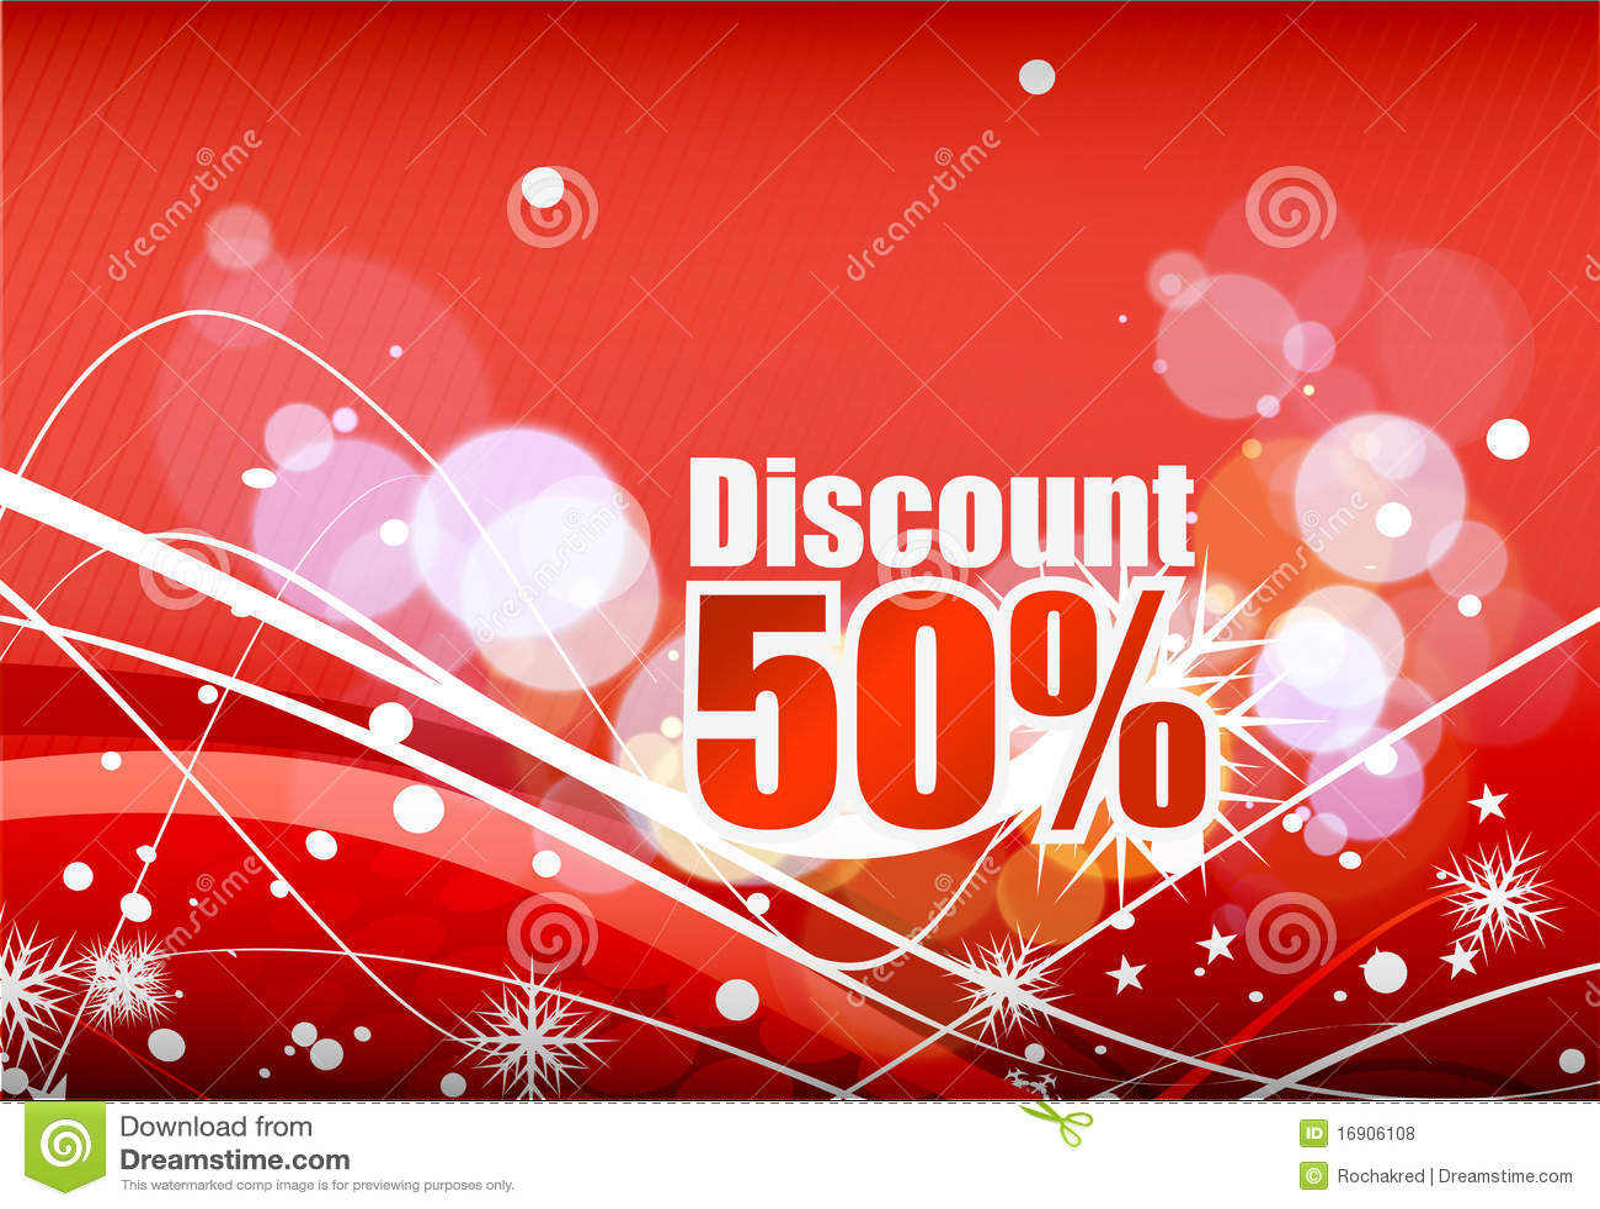 Design of discount card - Discount Card Design Royalty Free Stock Photos